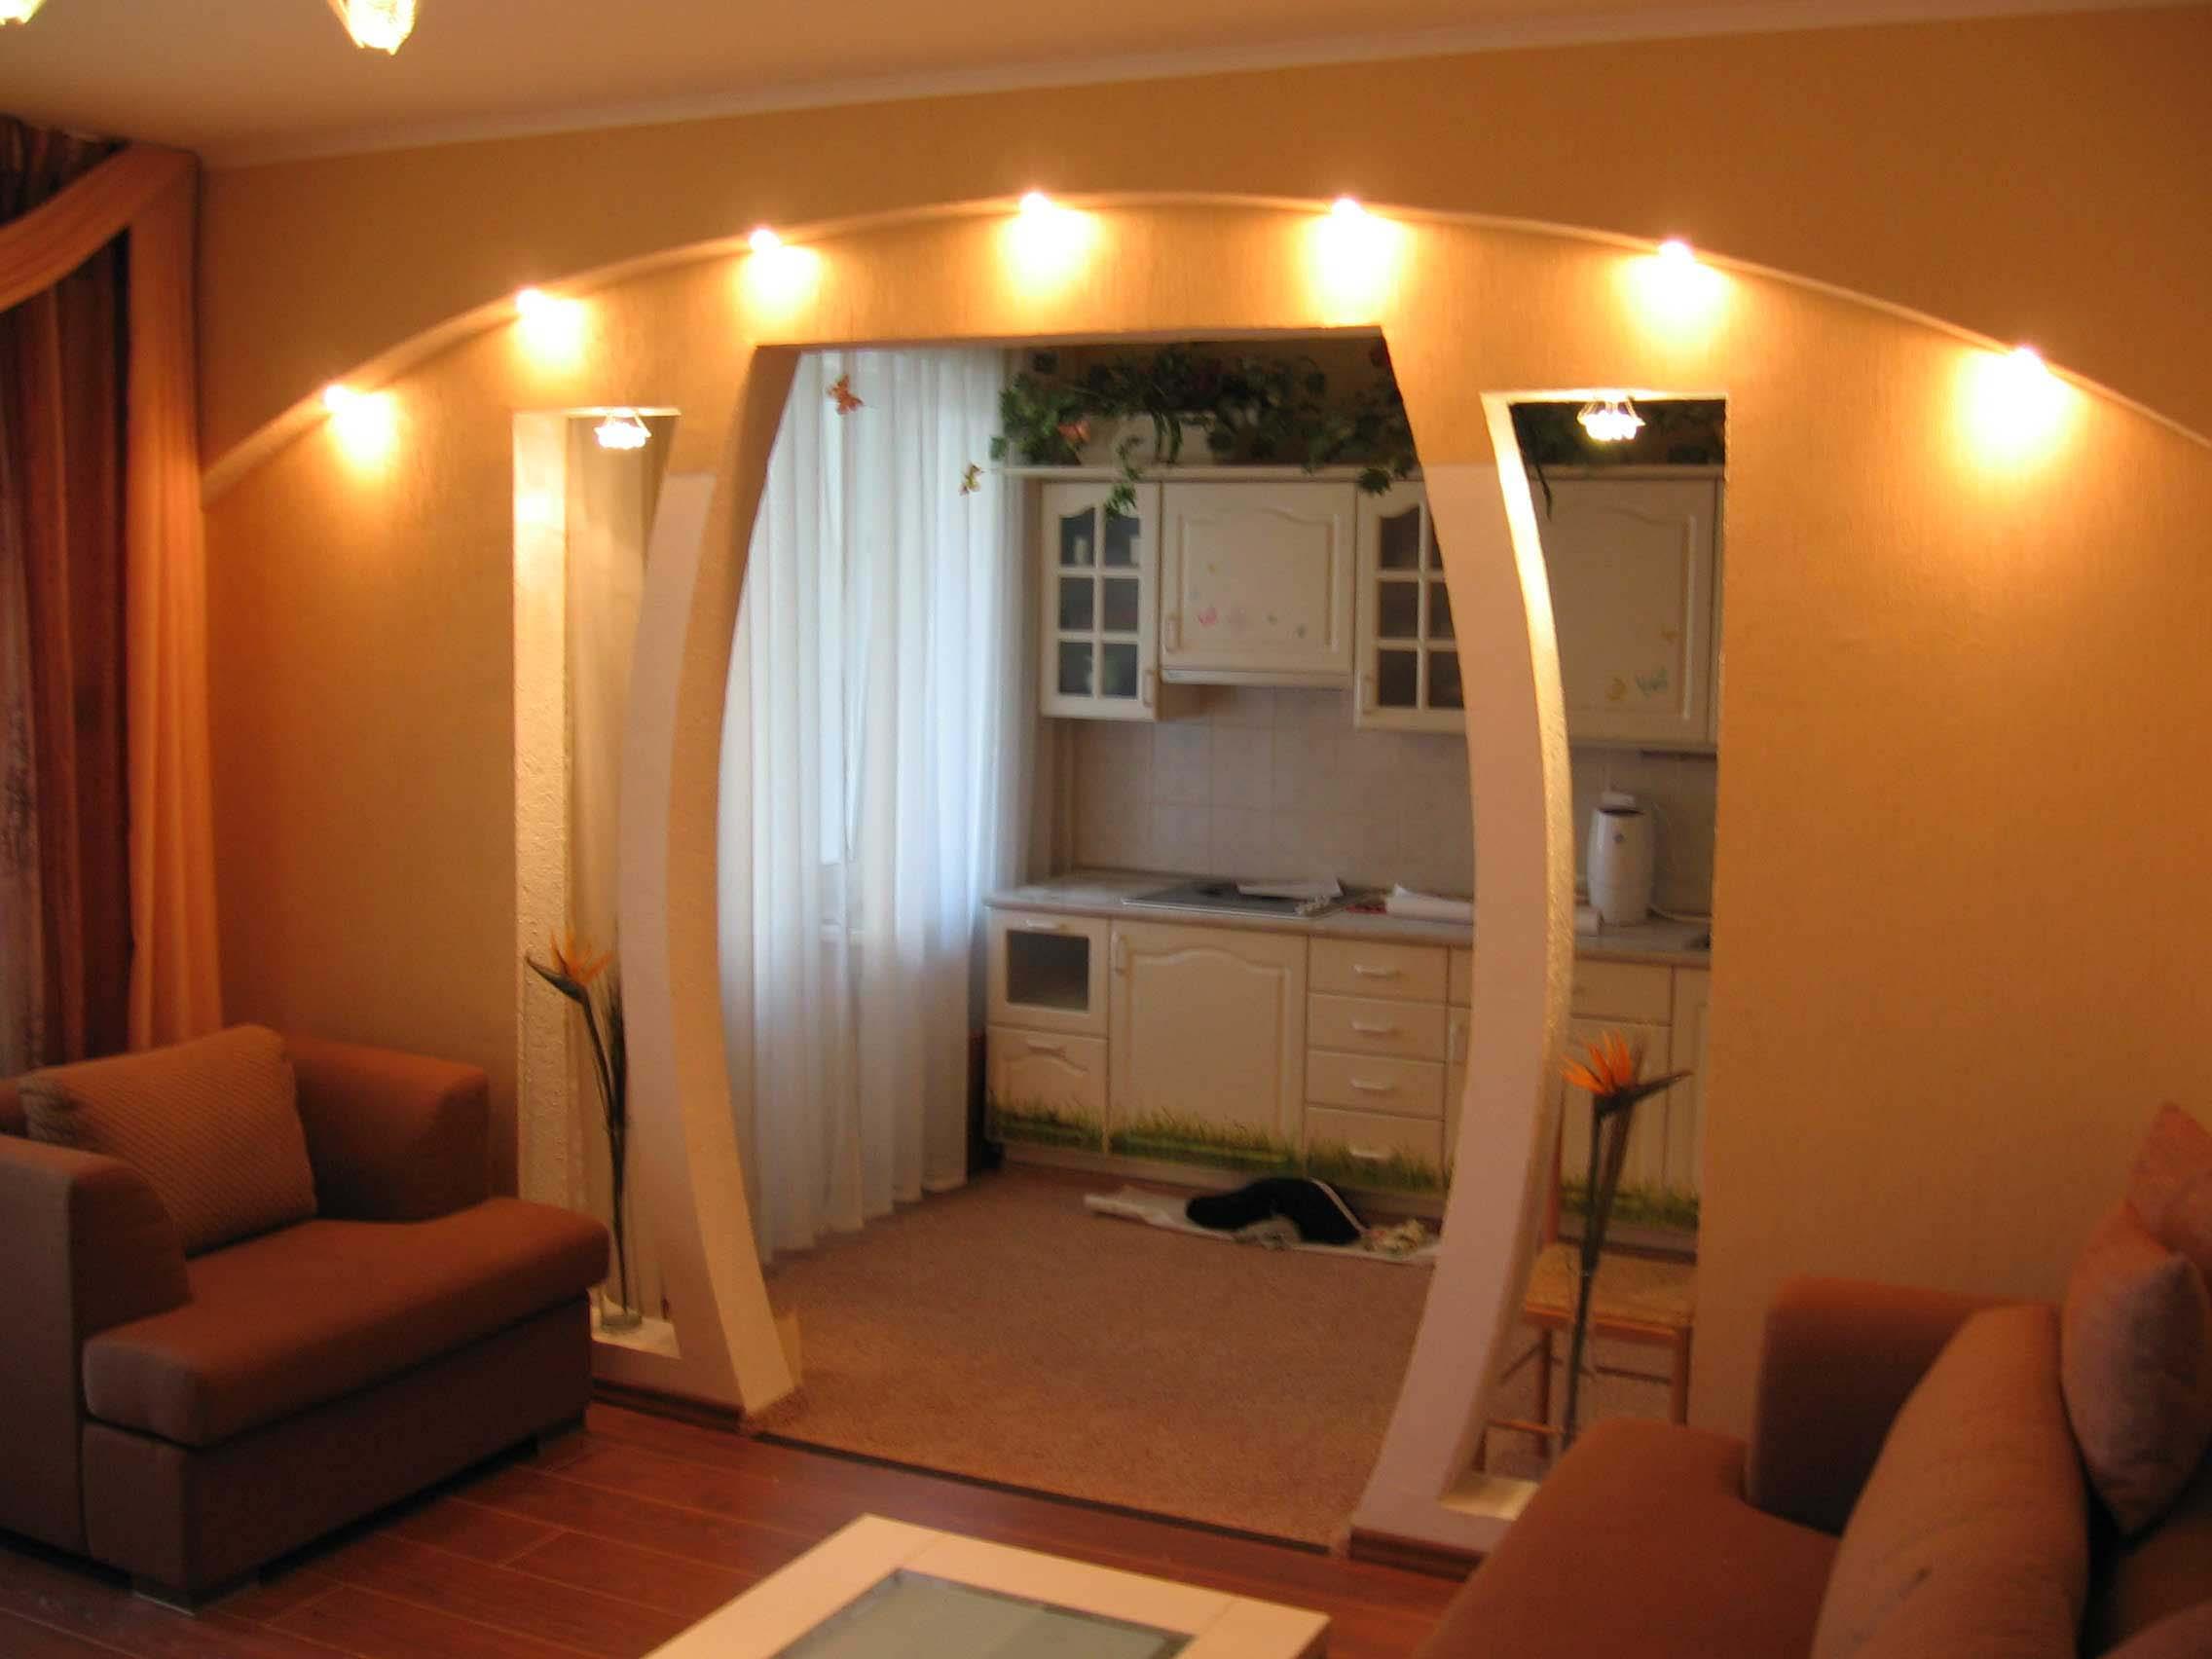 Appartamento a Catania per € 20.000